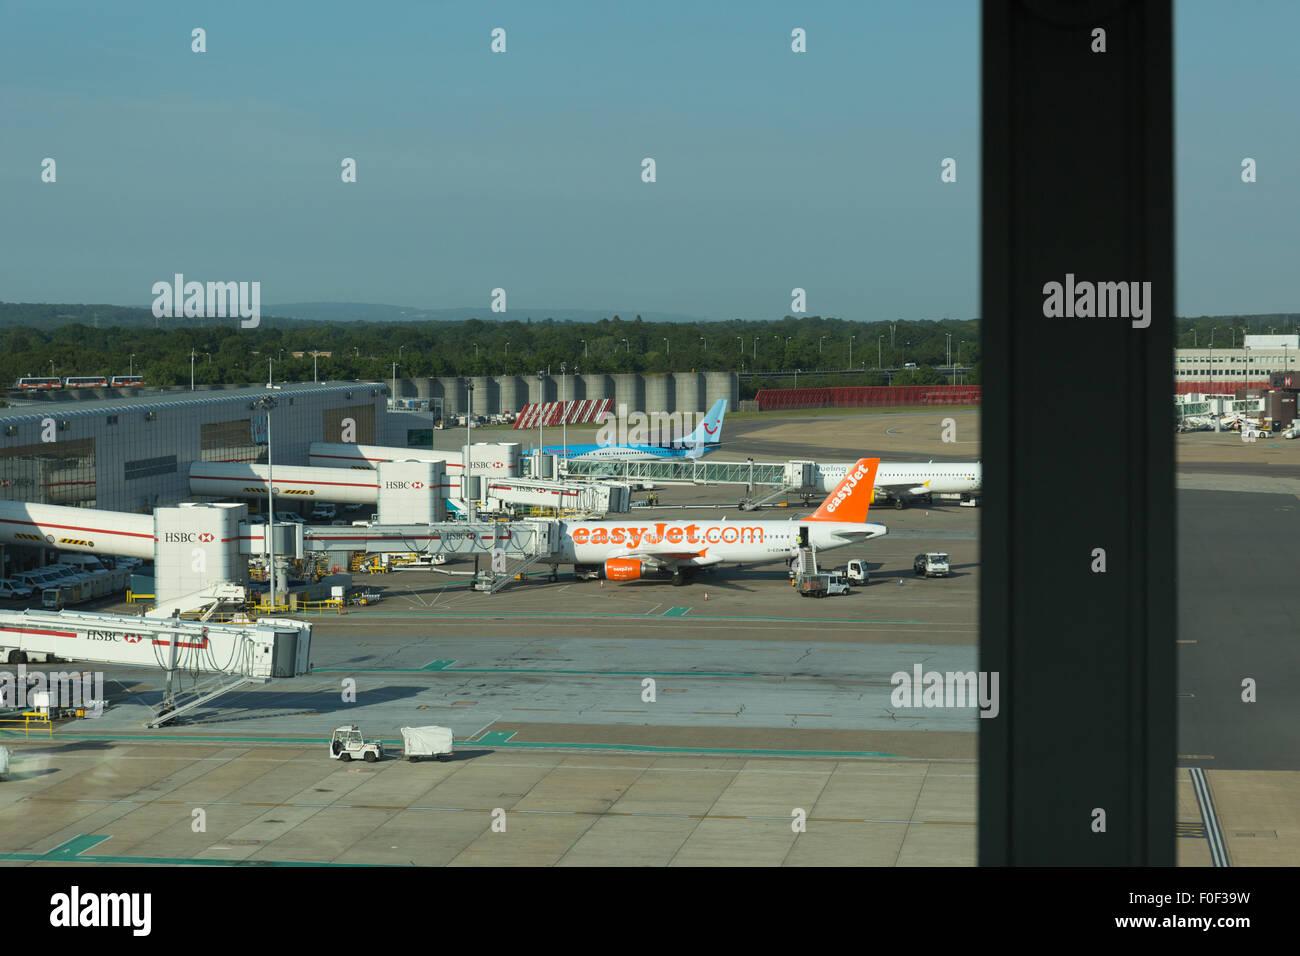 Gatwick airport apron with Easyjet plane and HSBC jet bridge - Stock Image